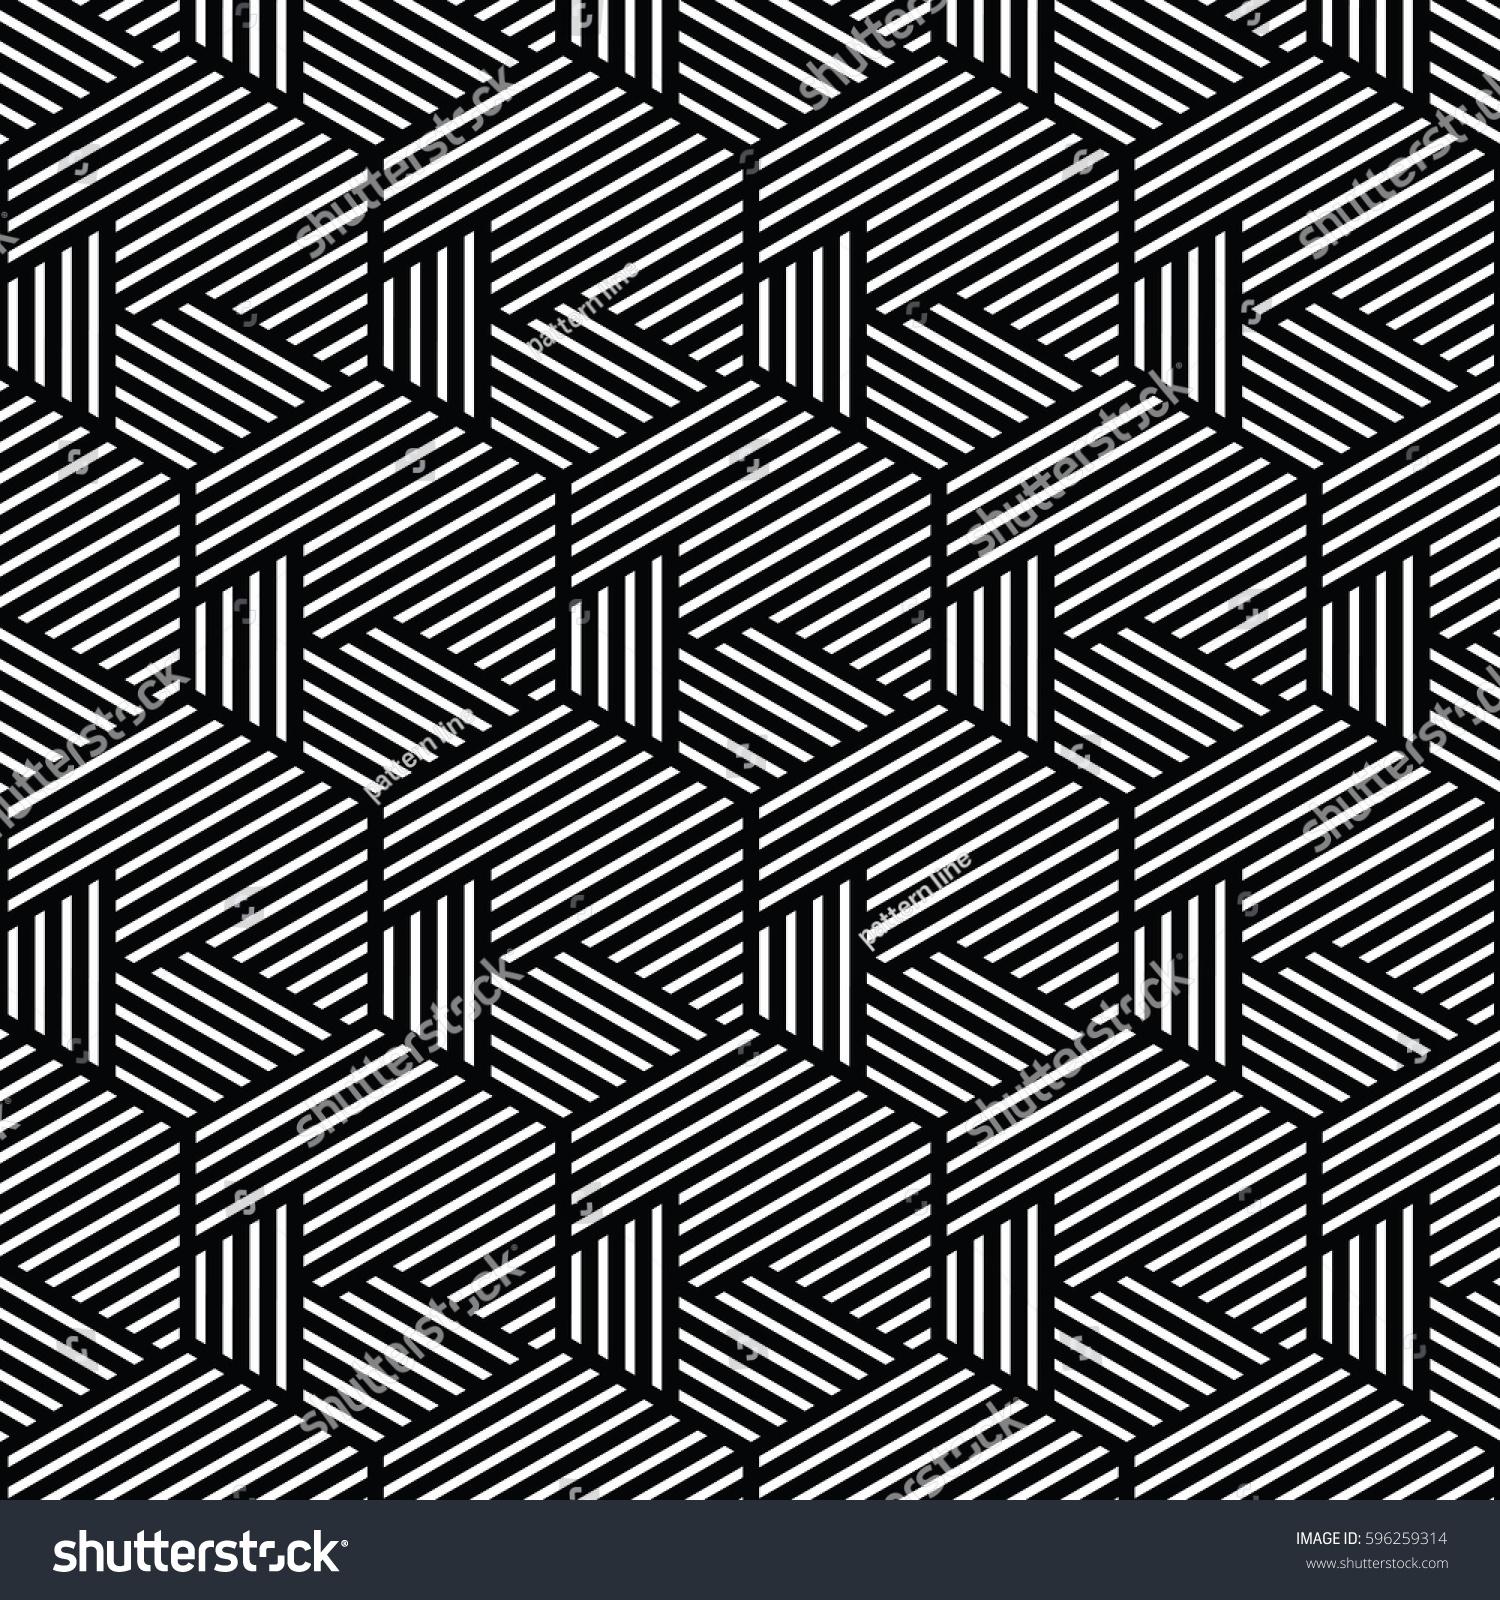 Line Texture Vector : Yellow white patternbackground line geometricmodern